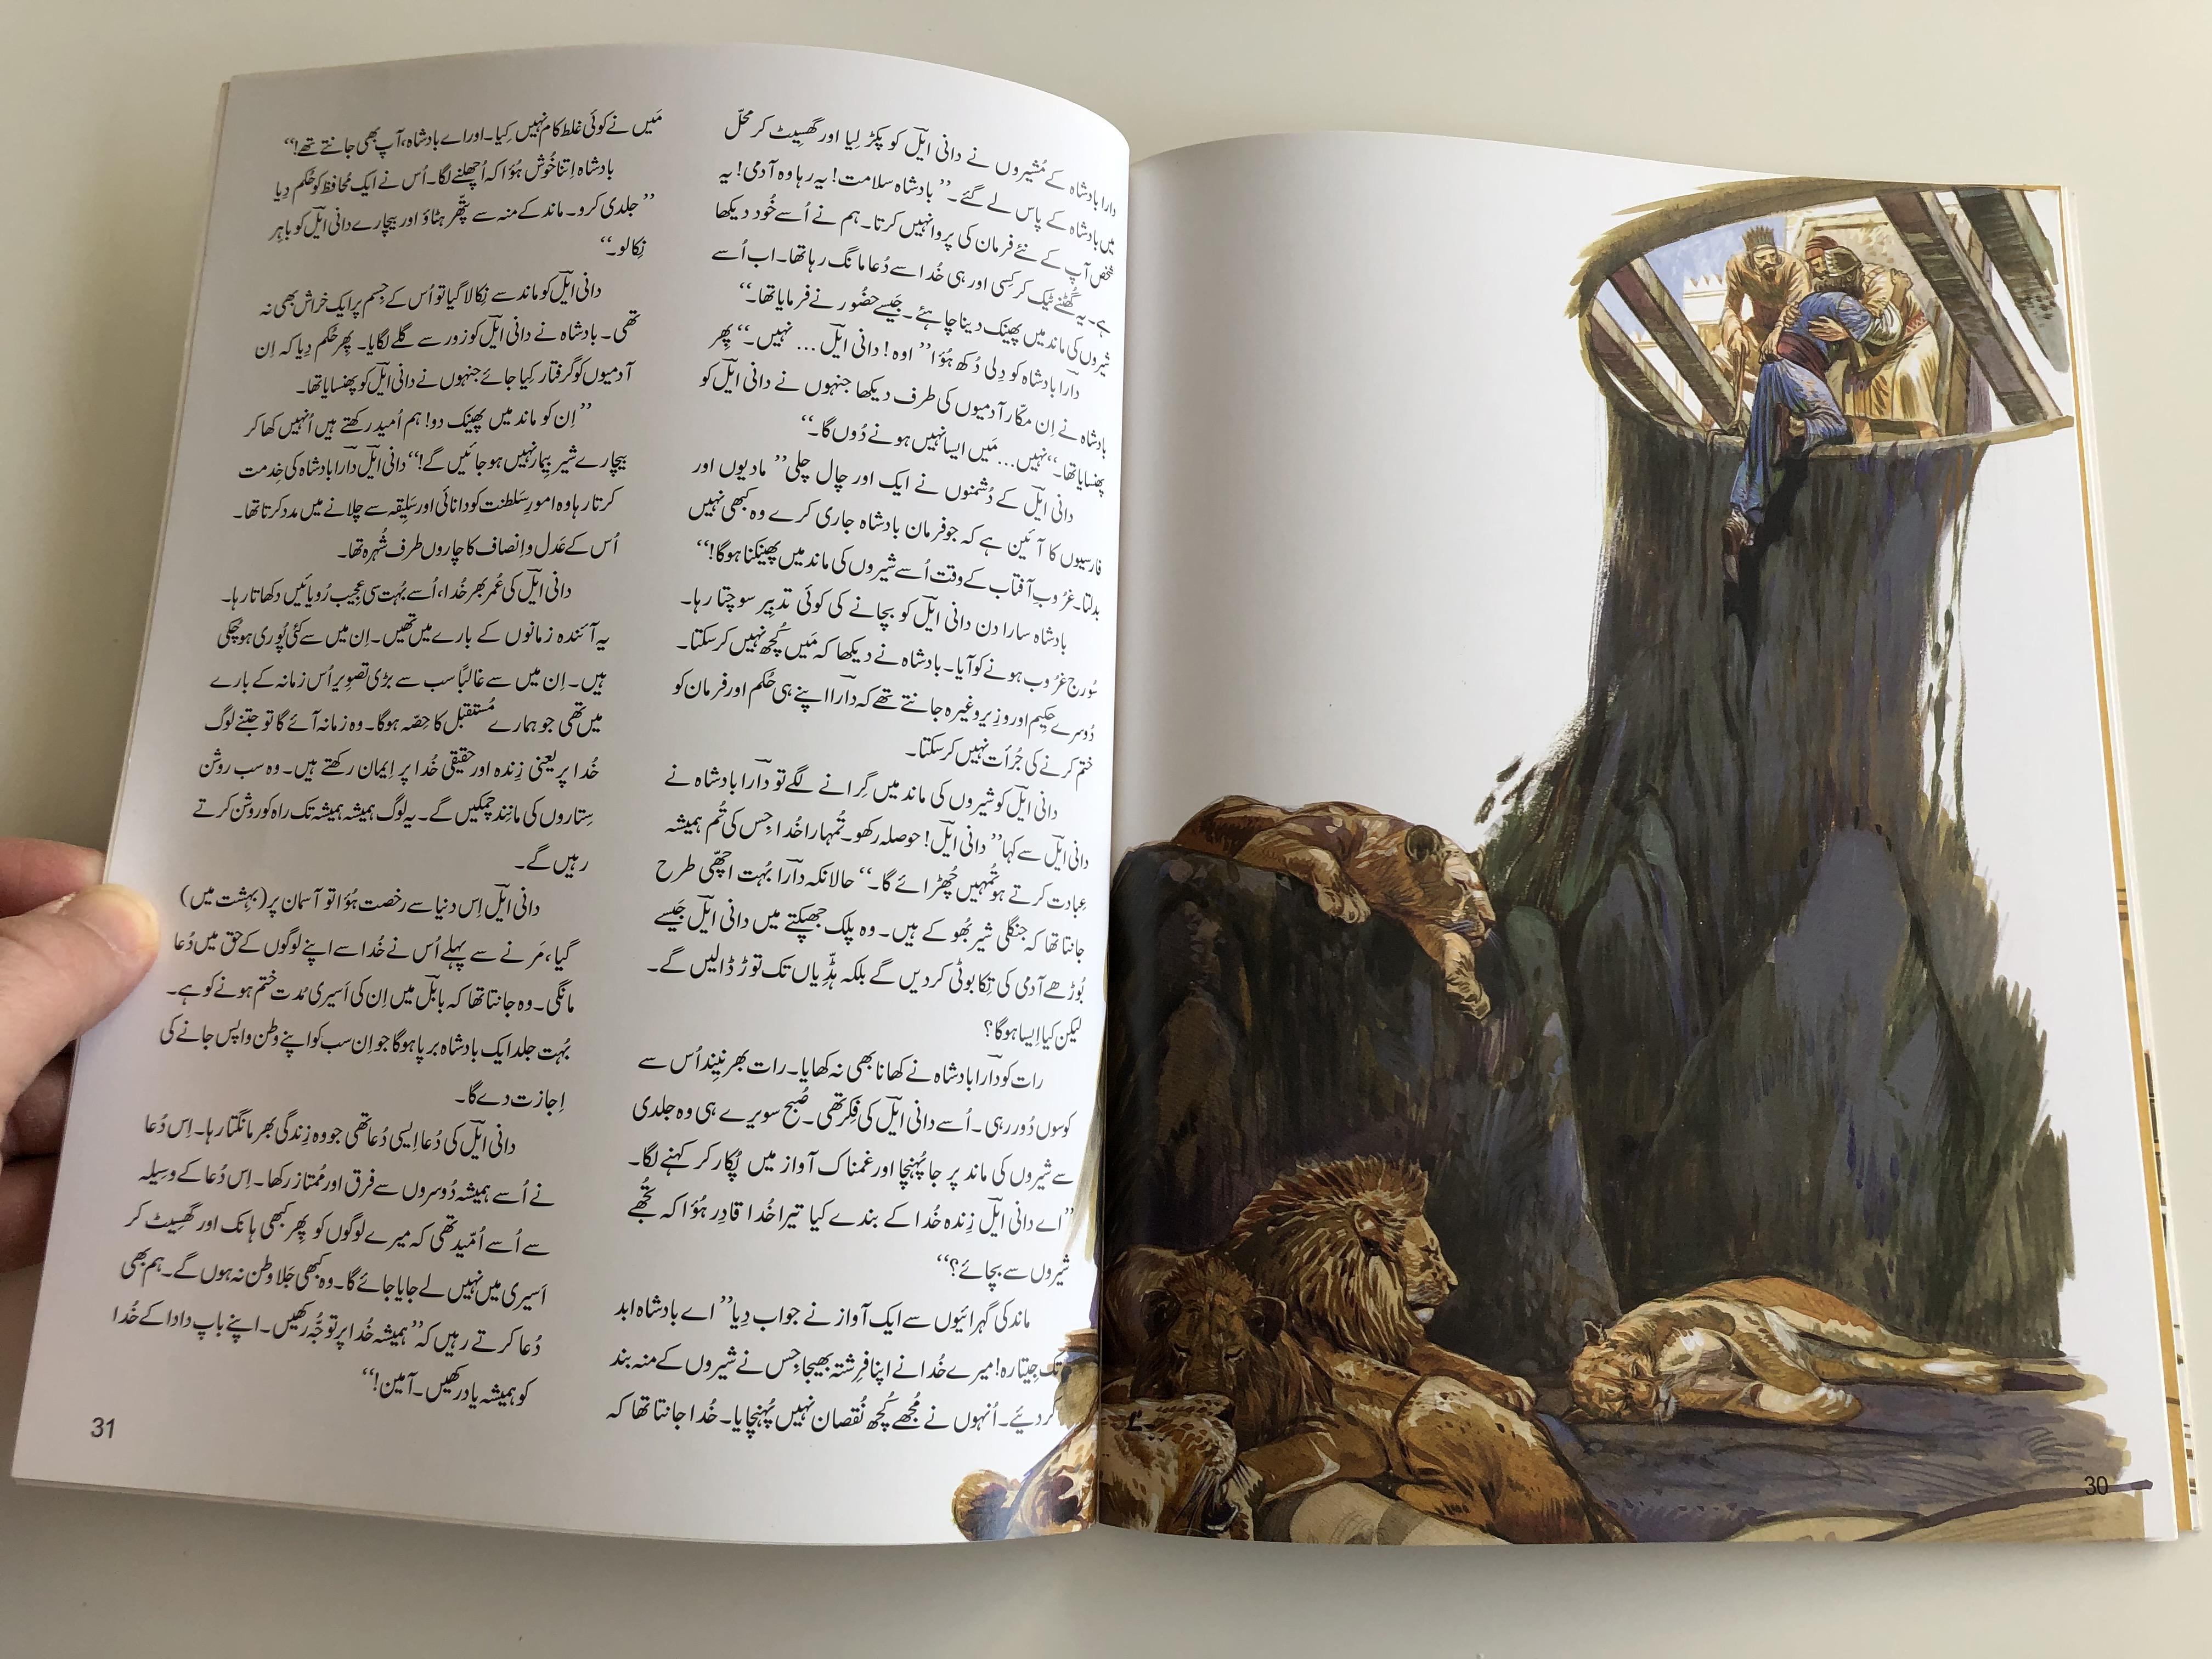 daniel-prisoner-with-a-promise-urdu-language-6.jpg